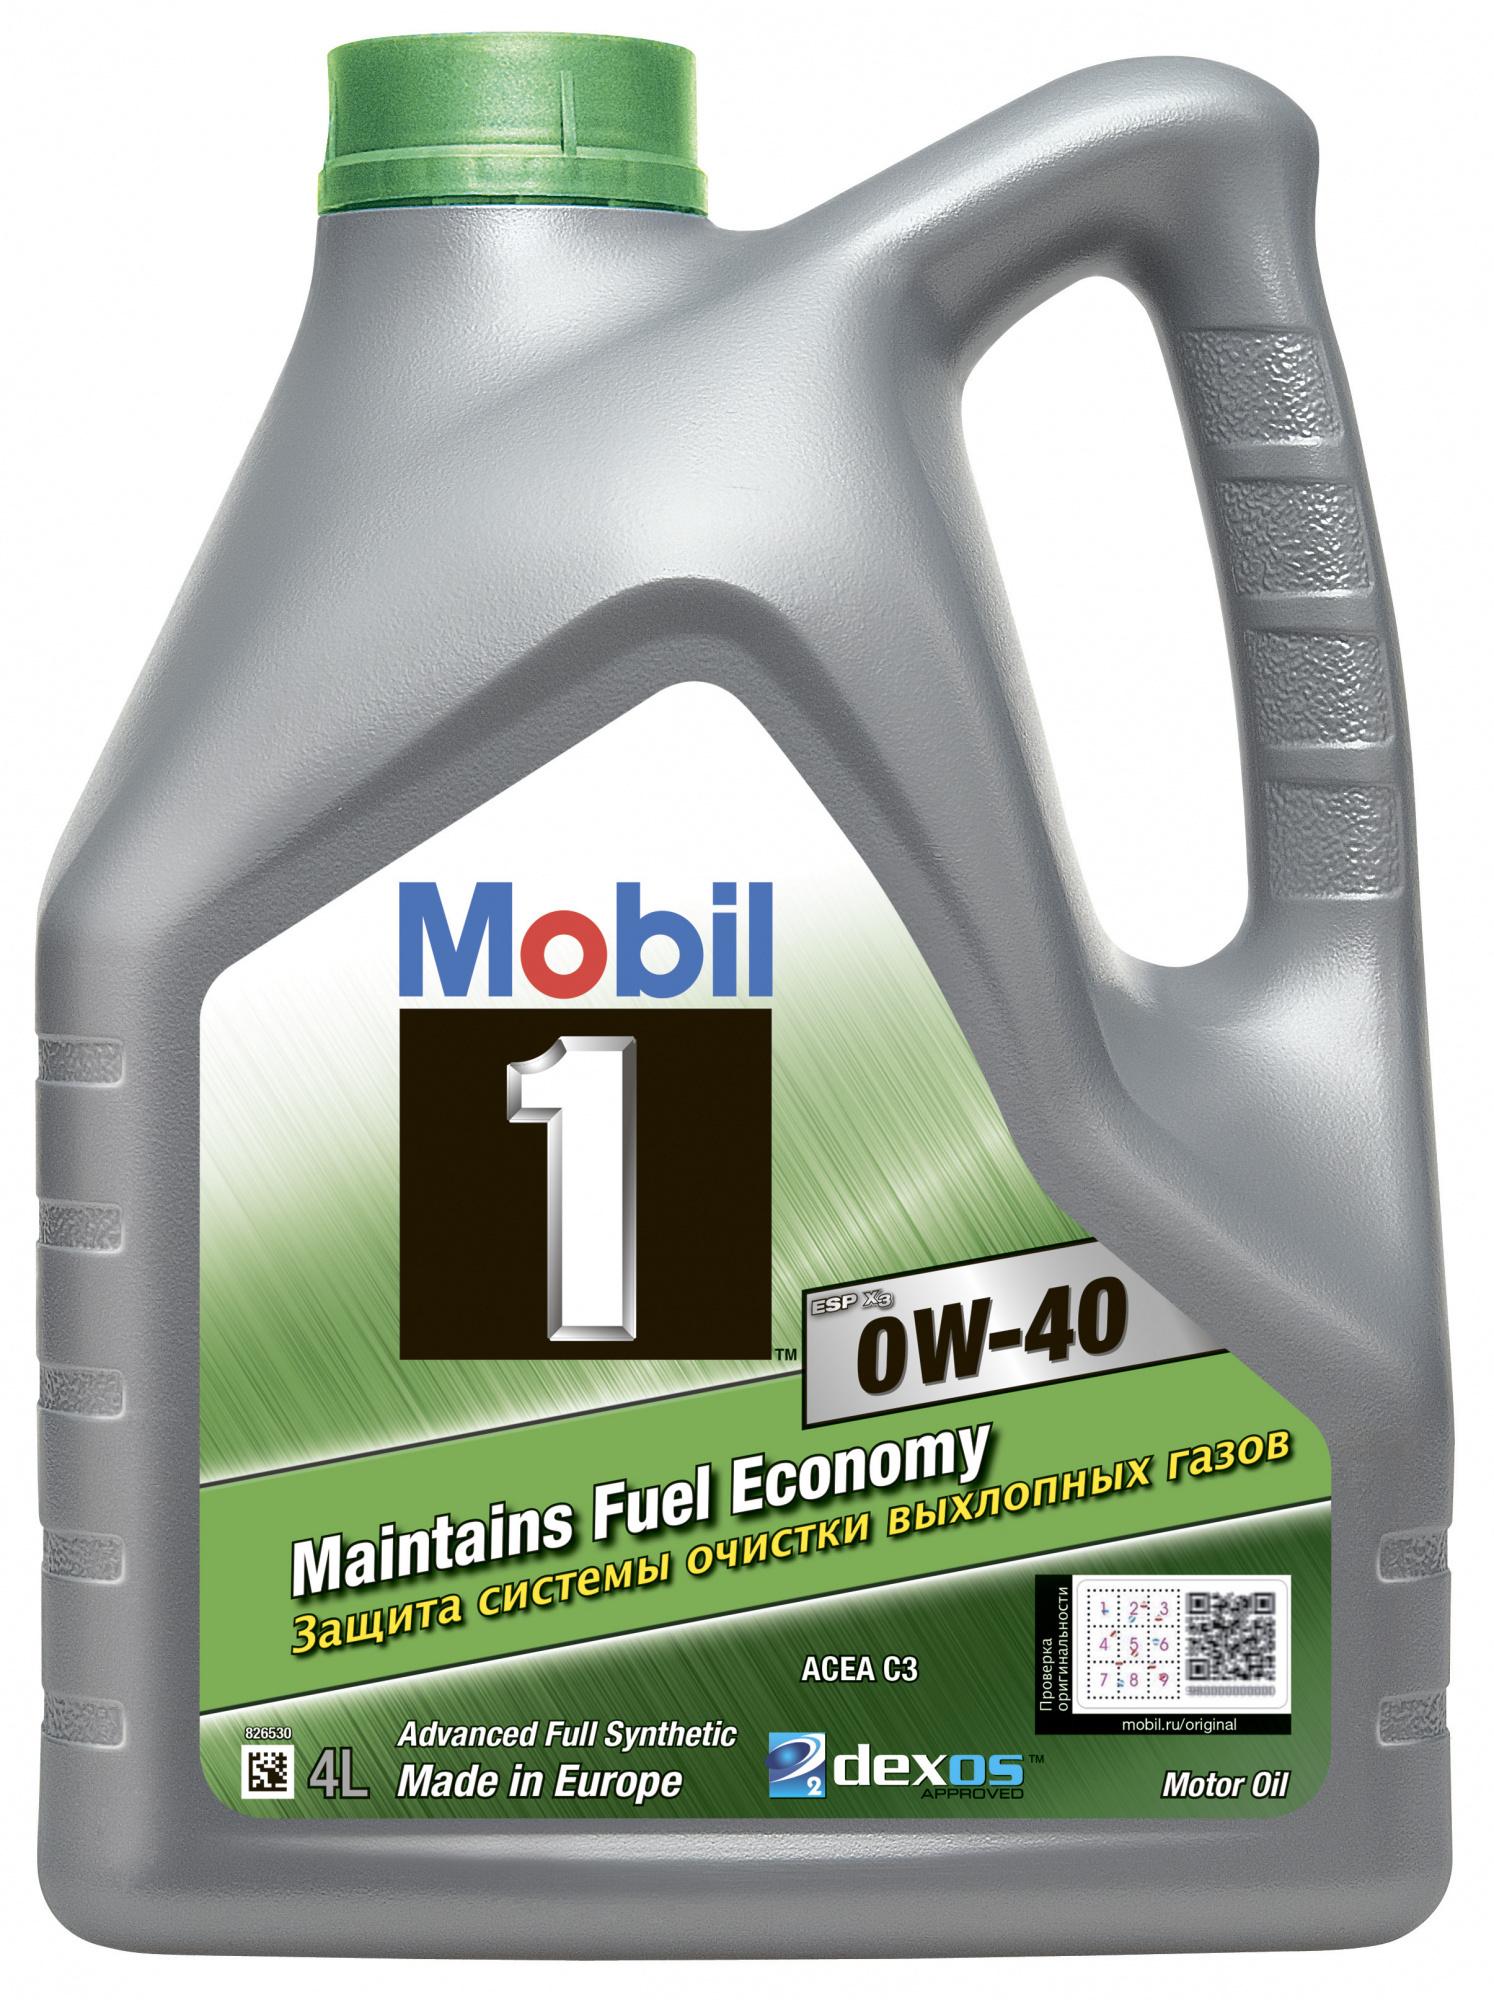 Mobil 1 ESP x3 0W40 Синтетическое моторное масло